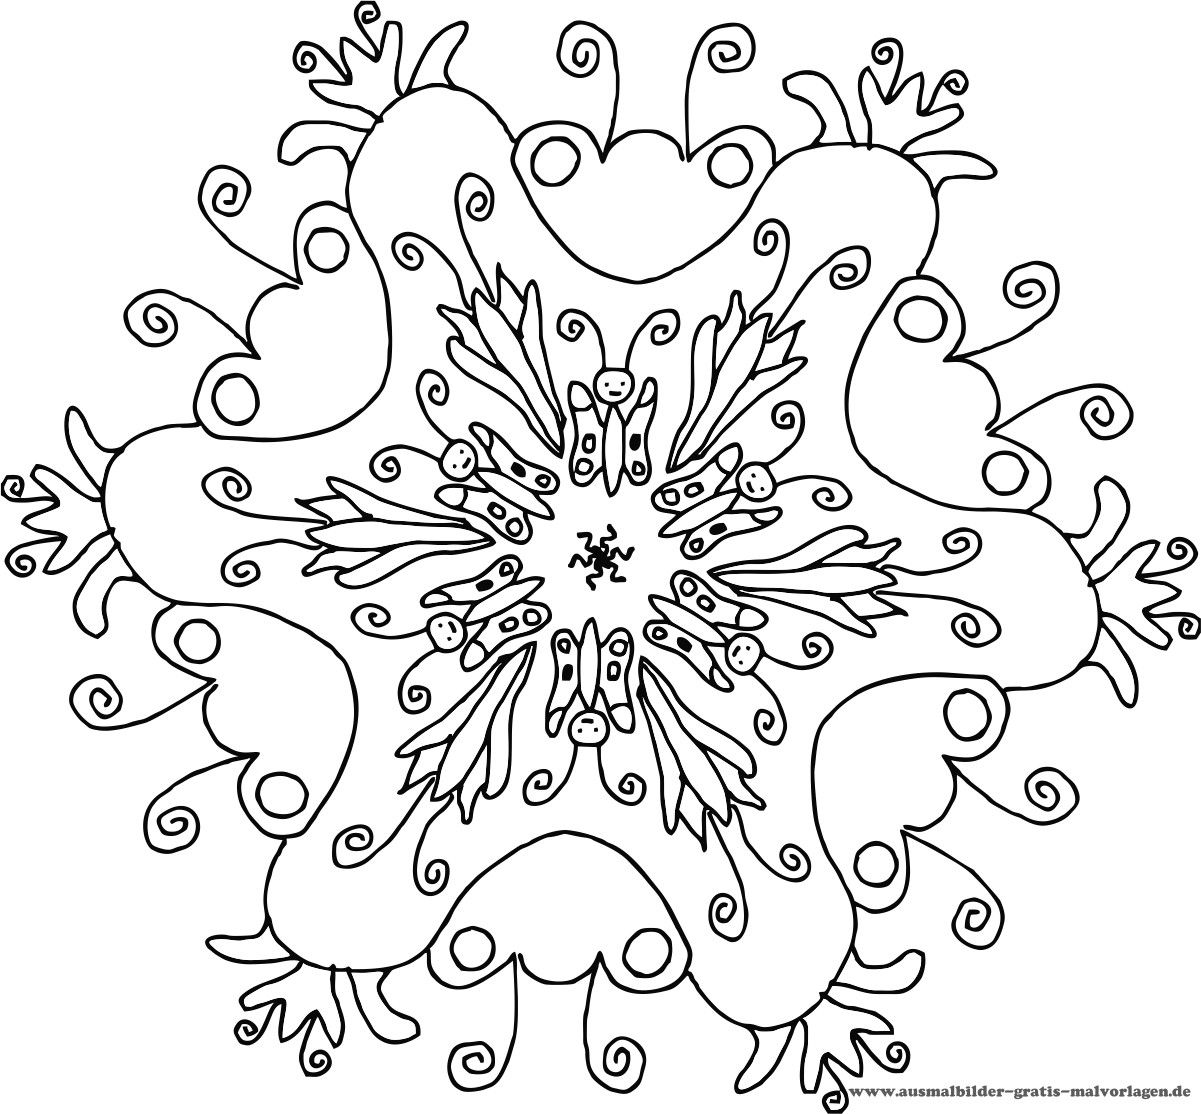 Mandalas Mandalas zum Ausdrucken kostenlose Mandala